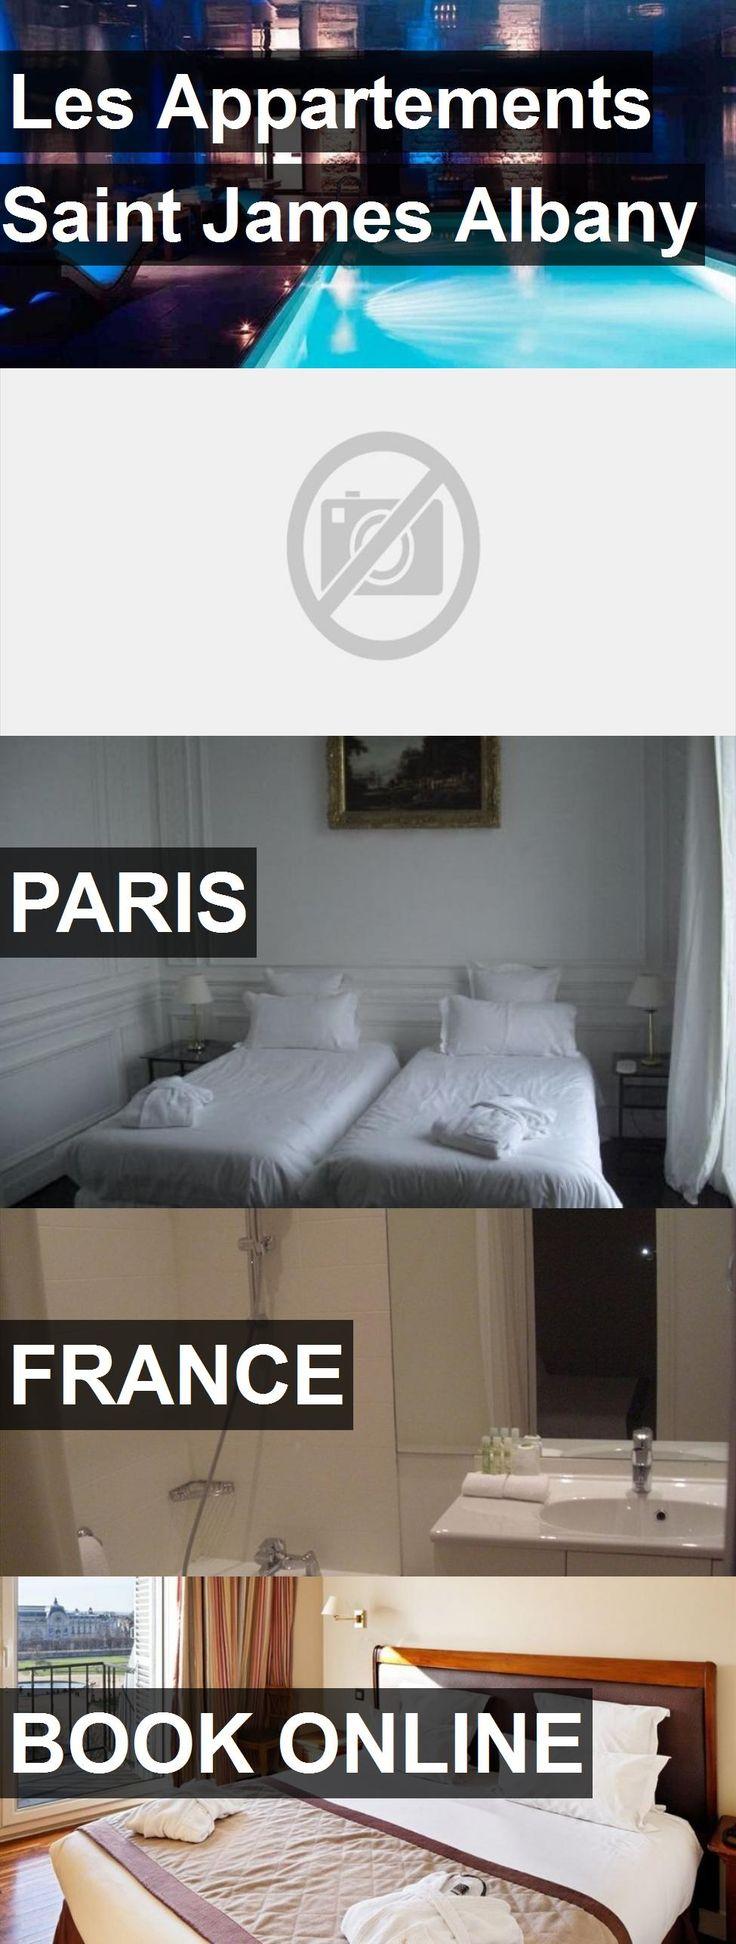 Best 25+ Saint james ideas on Pinterest | Saint james clothing ...